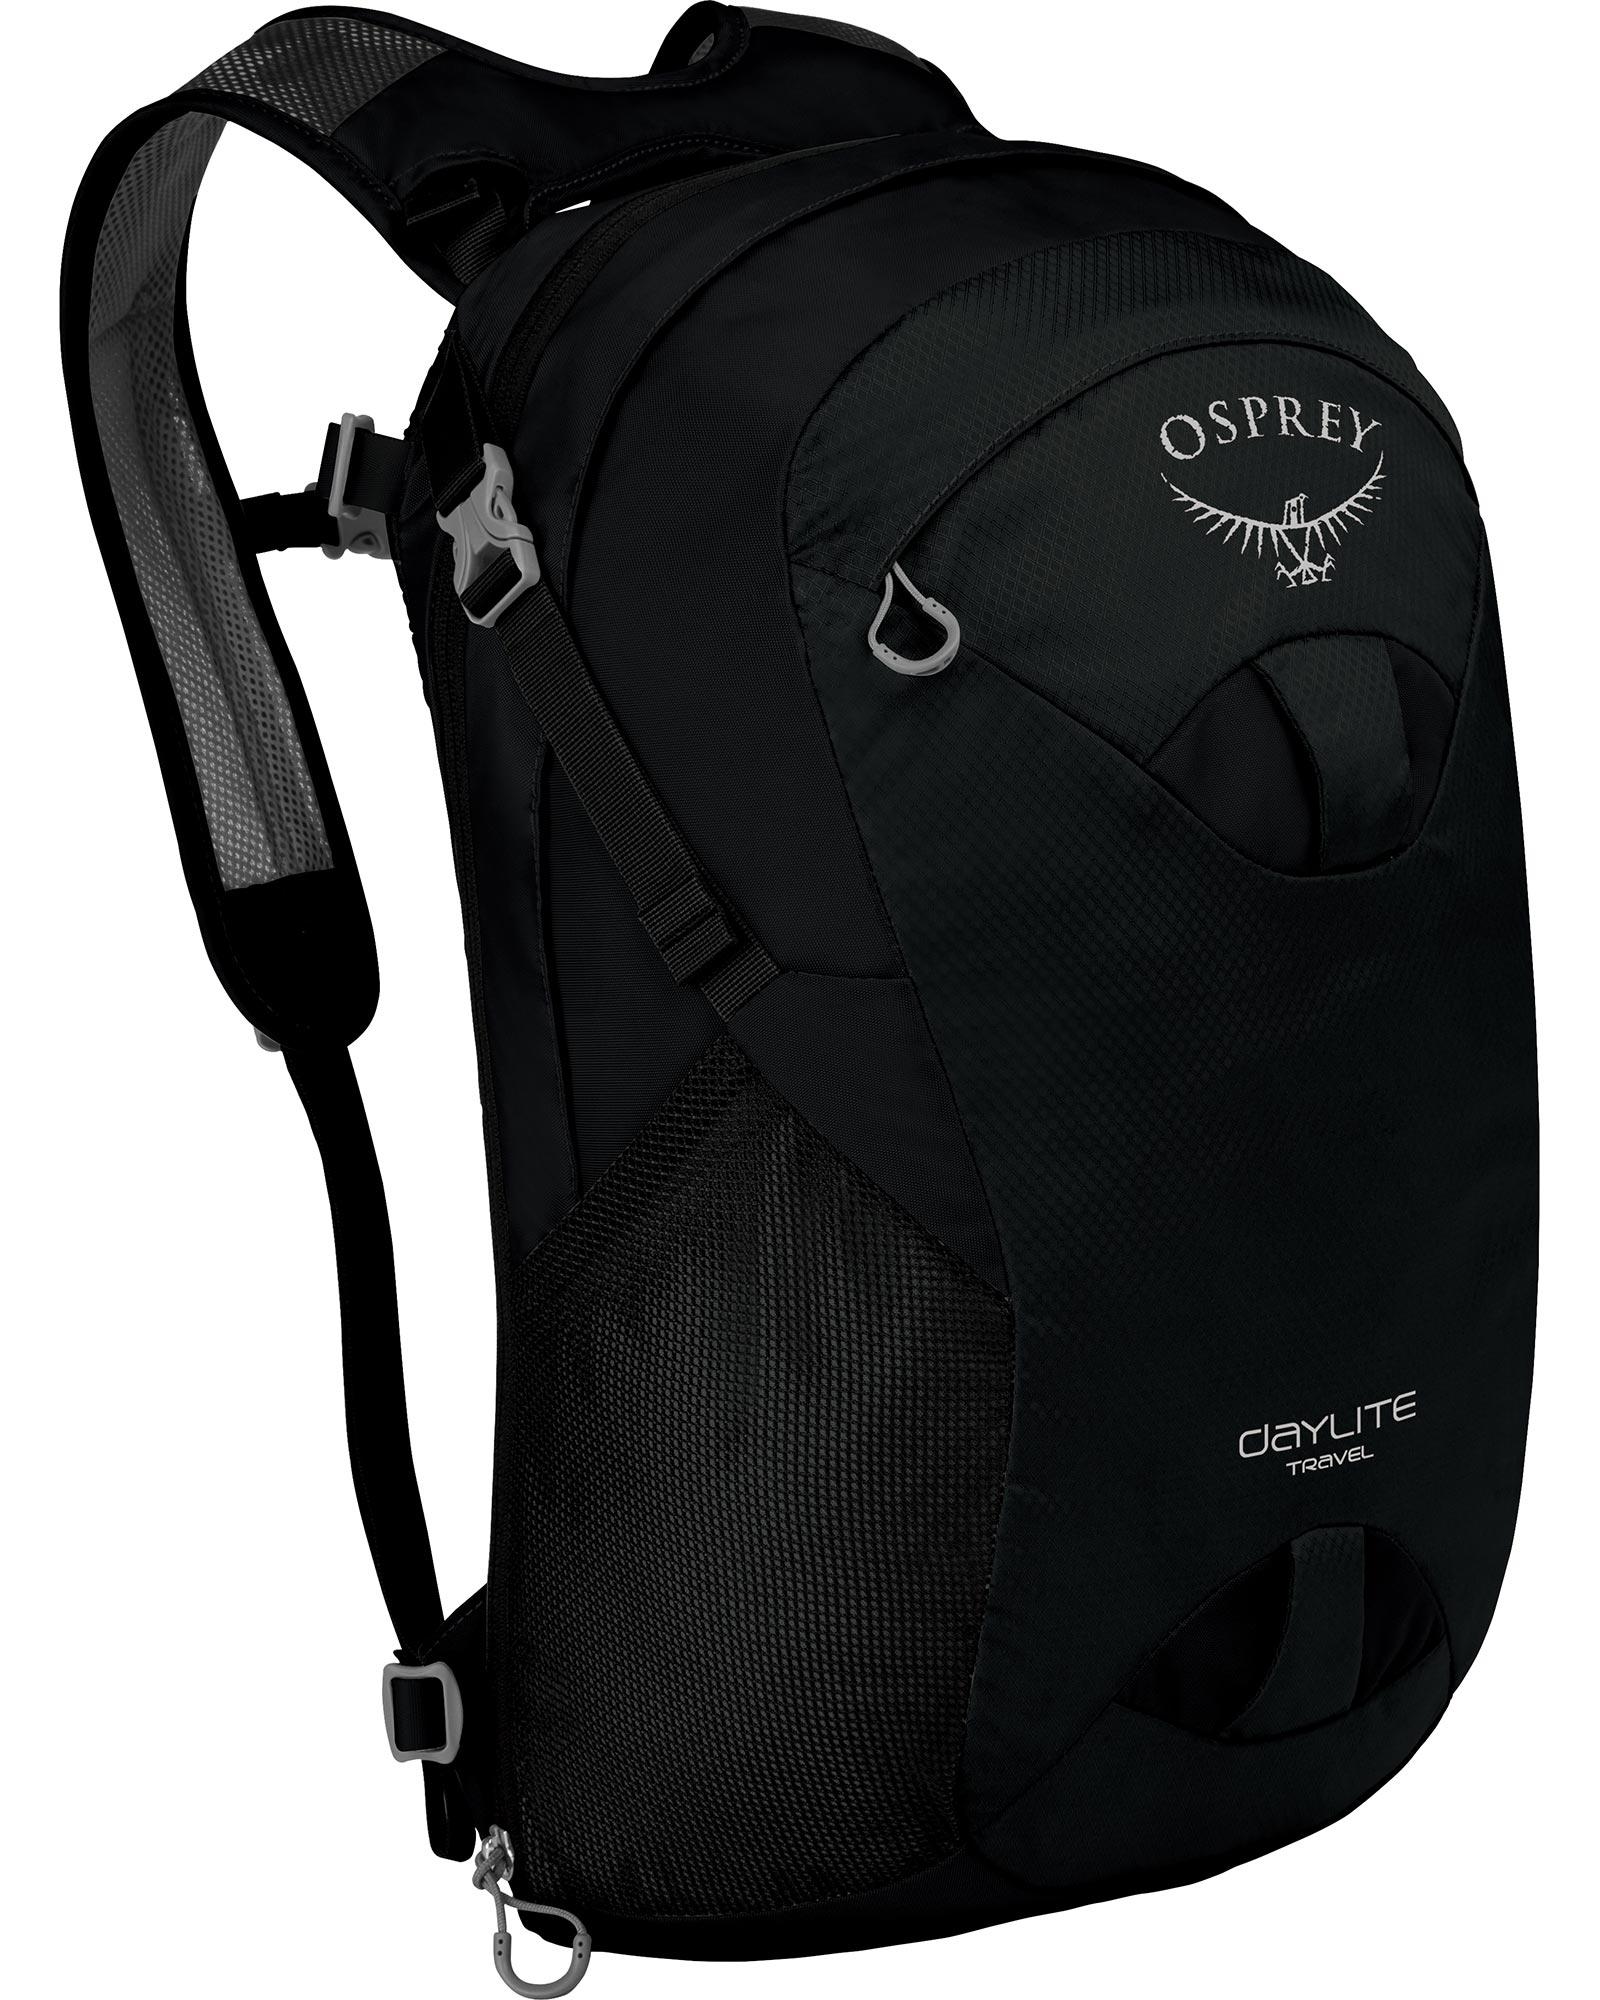 Osprey Daylite Travel Backpack 0